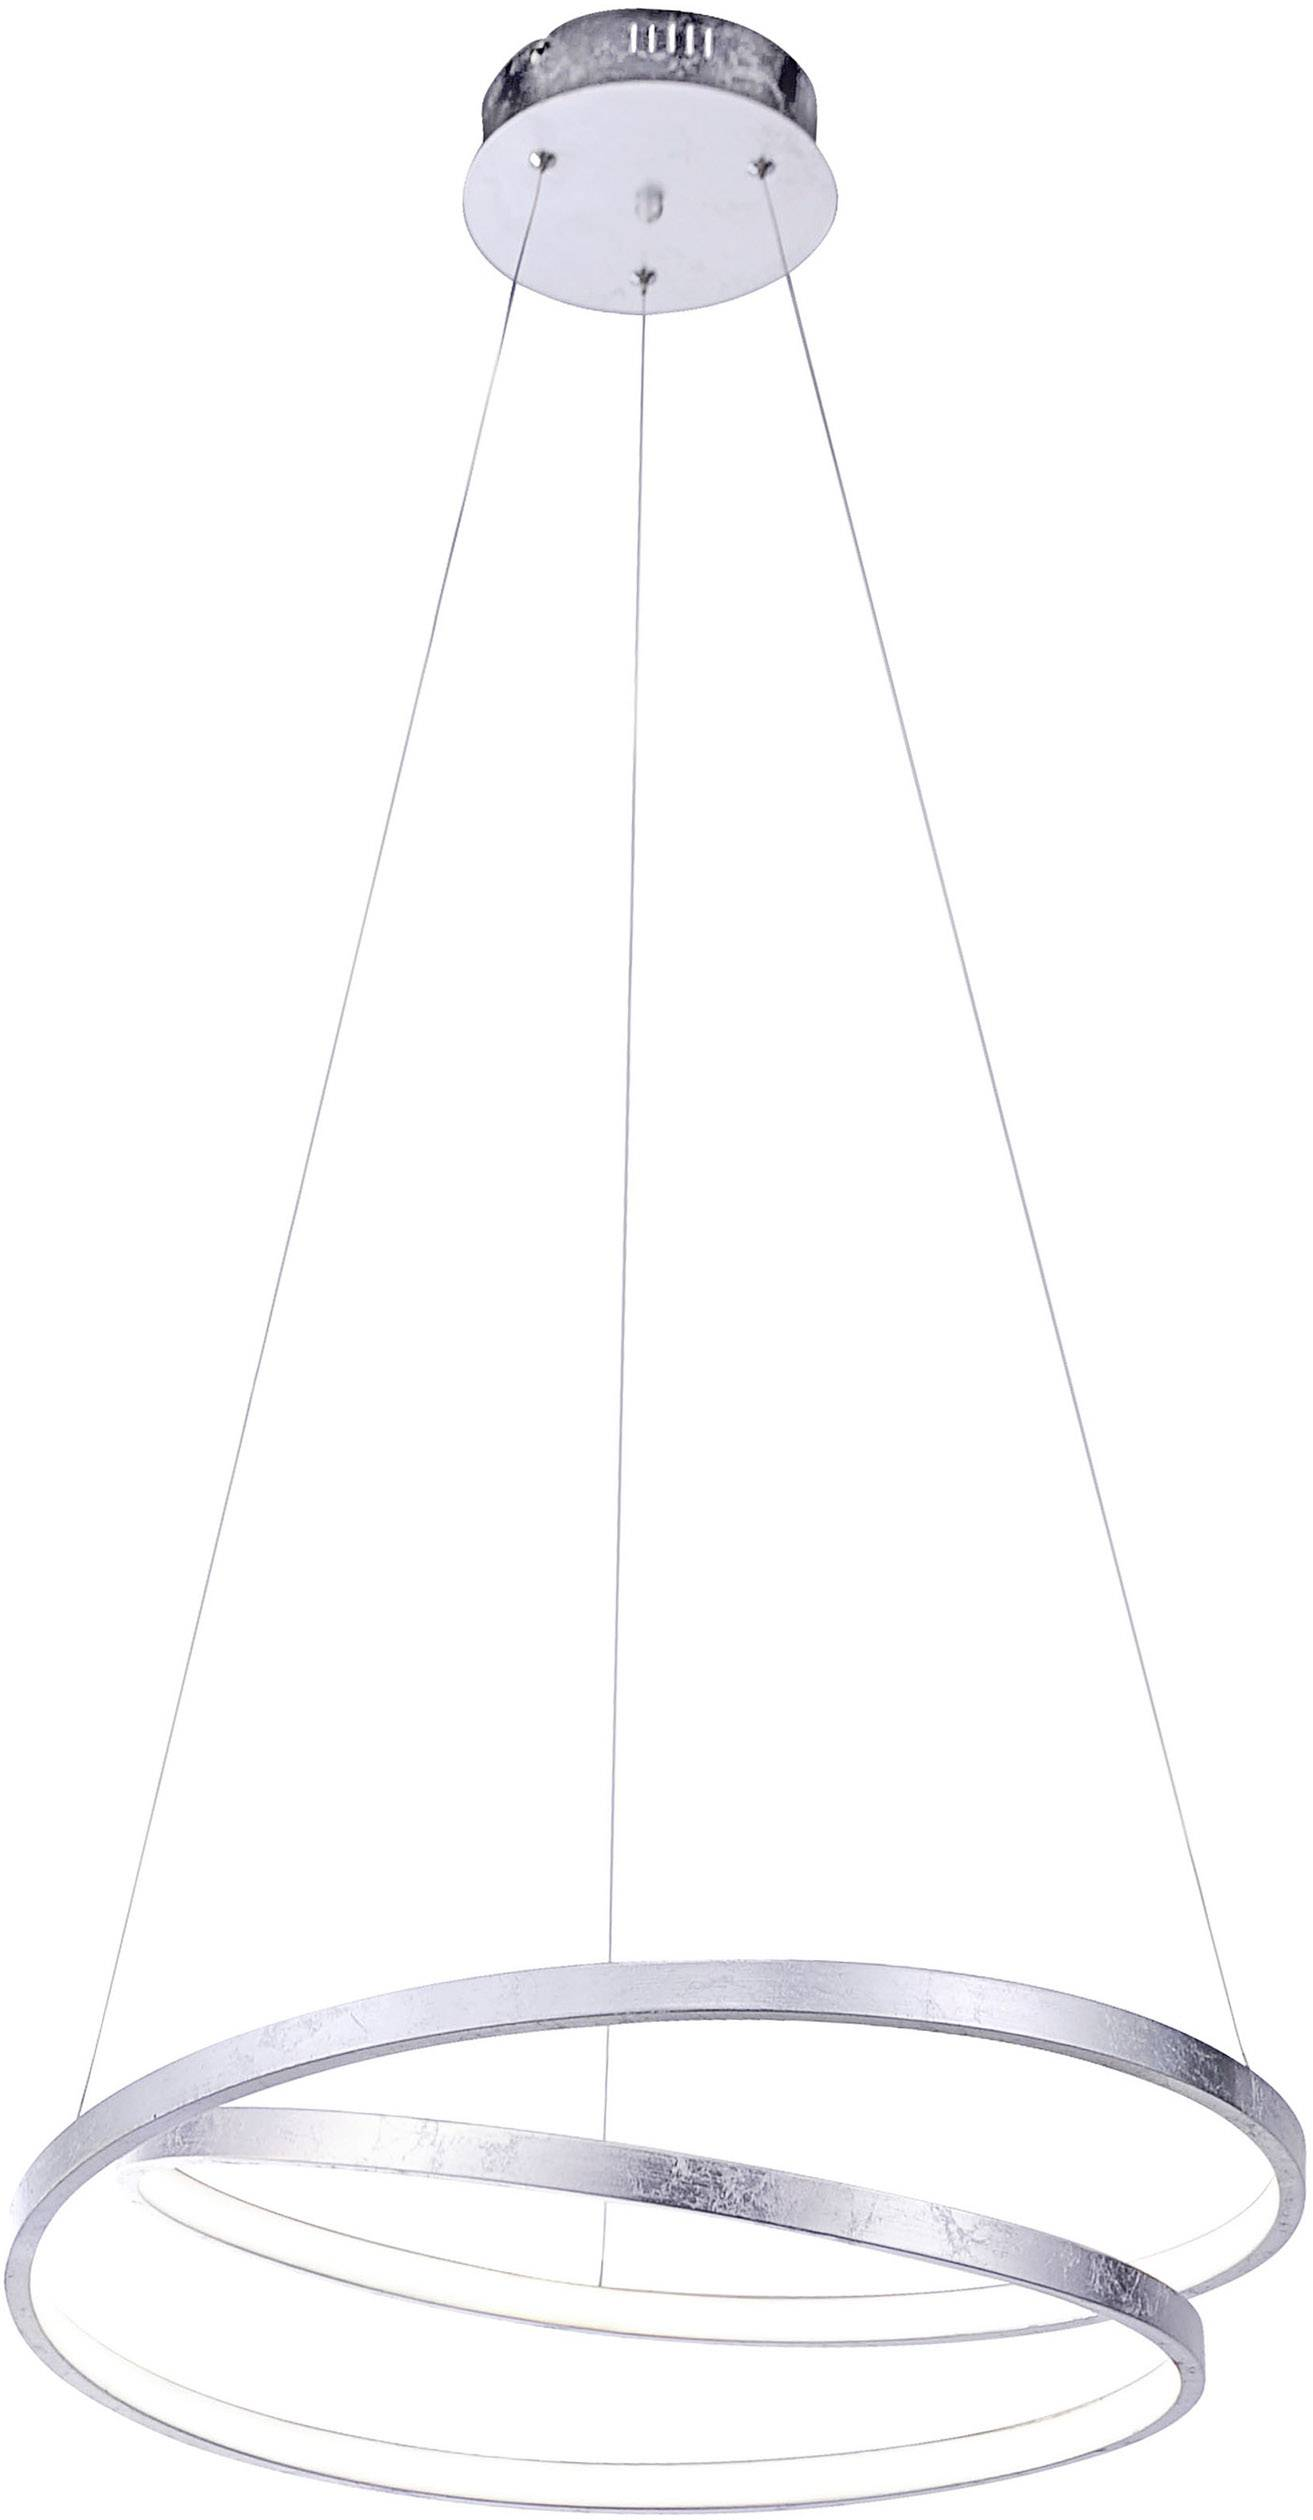 Paul Neuhaus ROMAN 2472 21 LED Pendelleuchte 30 W Warmweiß Silber